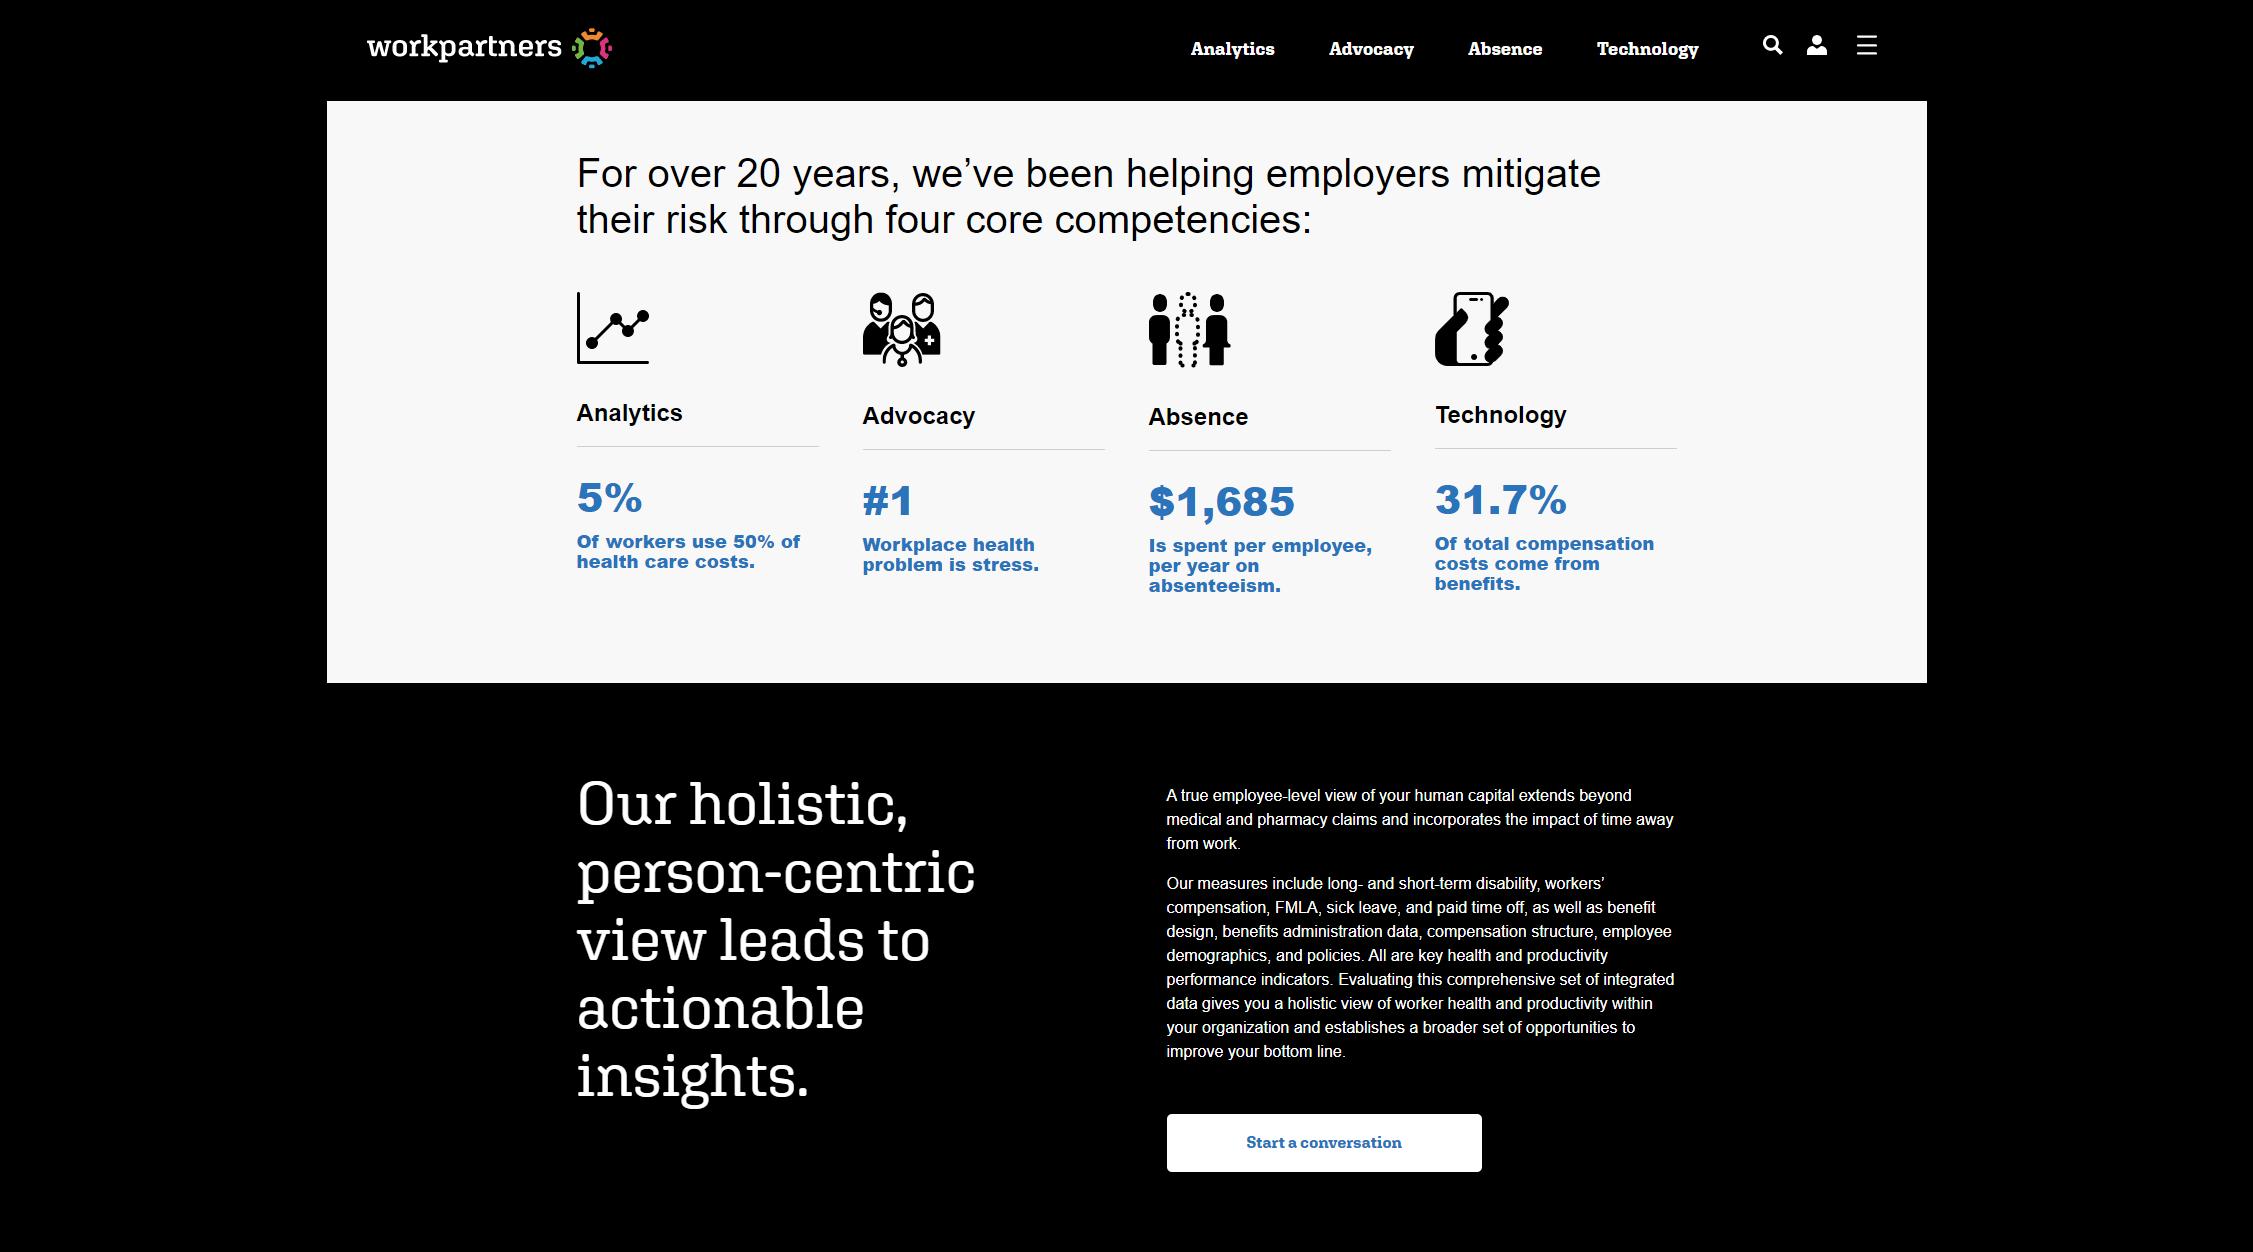 www.workpartners.com-2